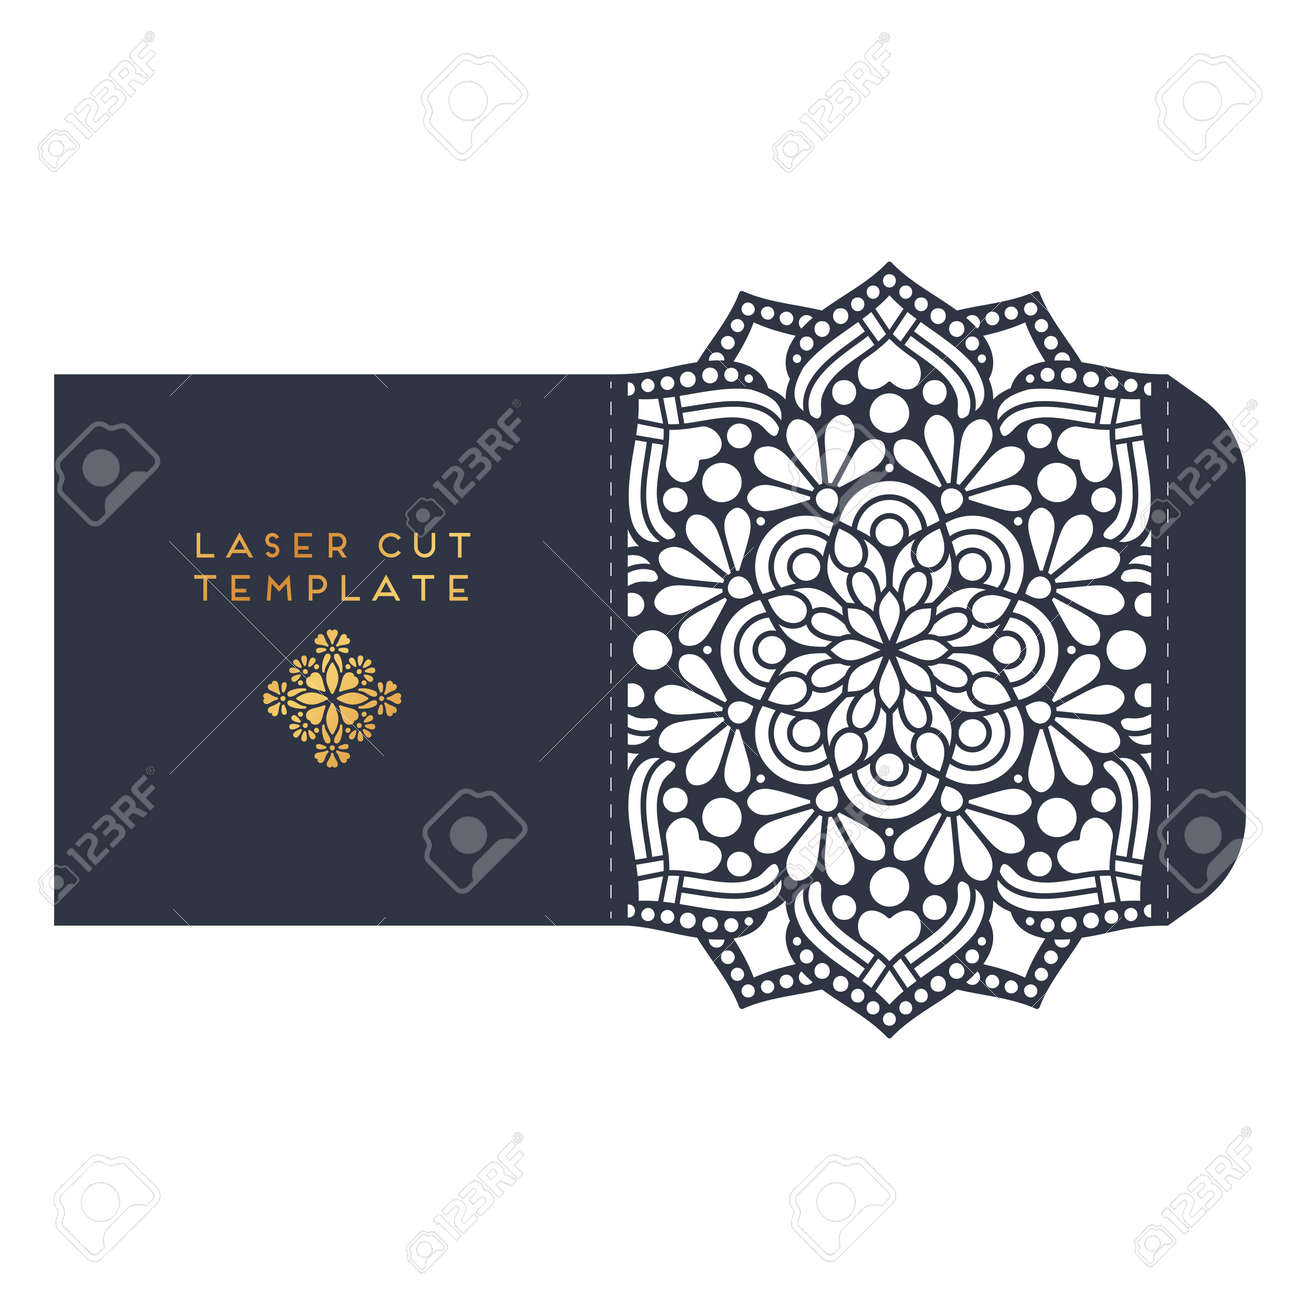 Vector Wedding Card Laser Cut Template. Vintage Decorative Elements ...